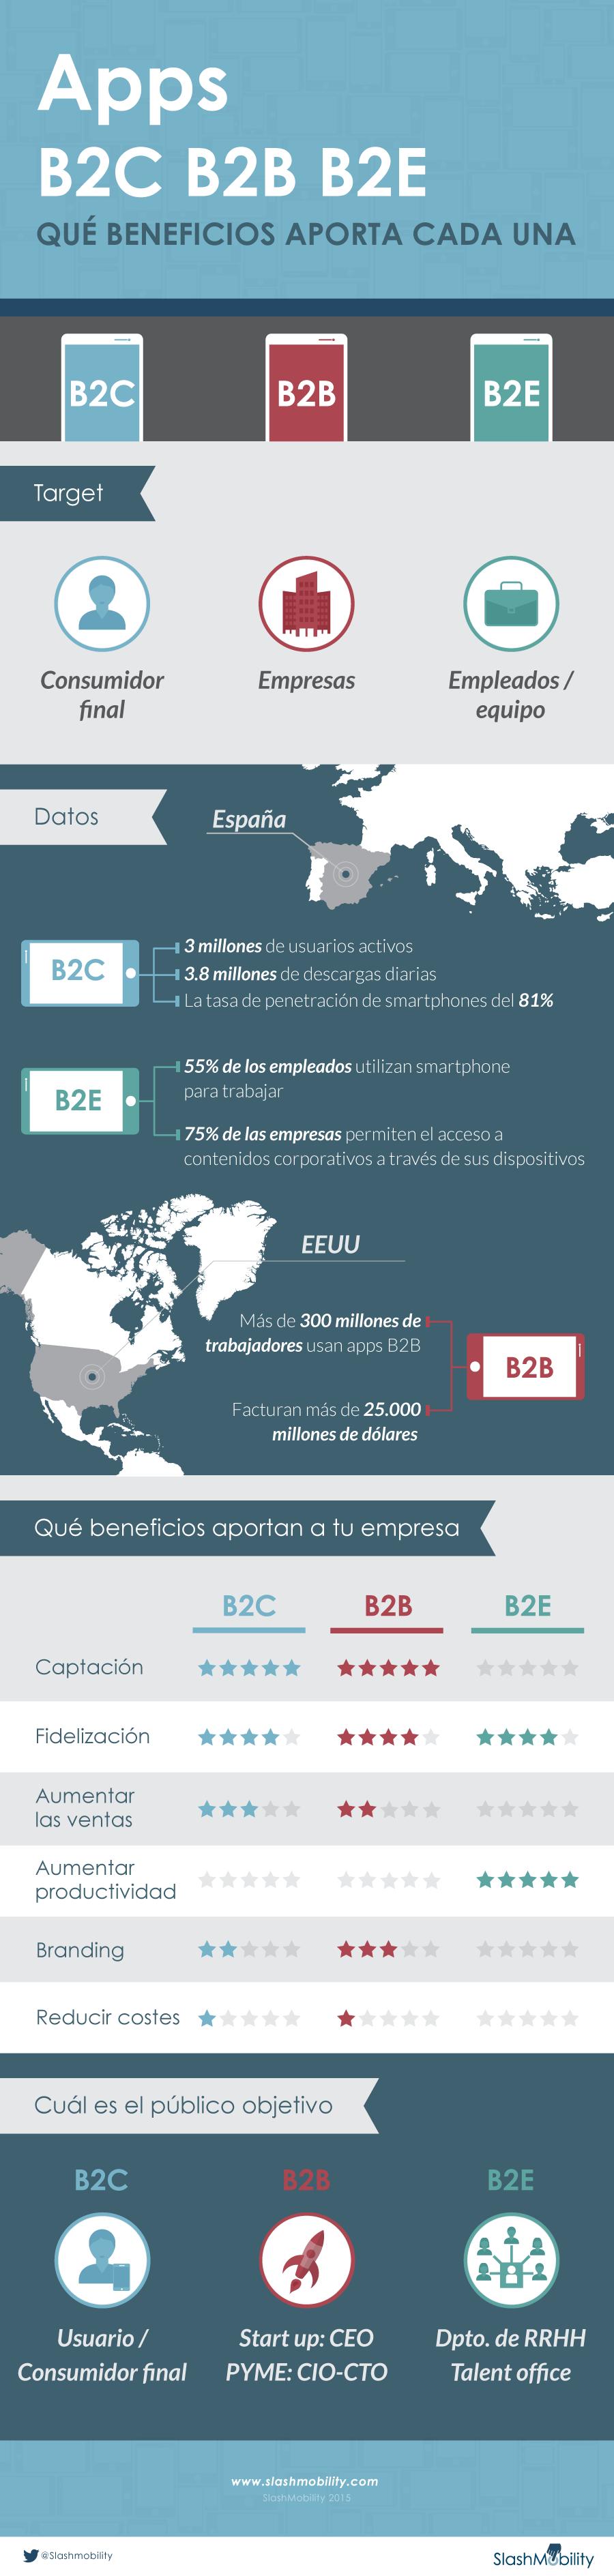 infografia-apps-b2c-b2b-b2e